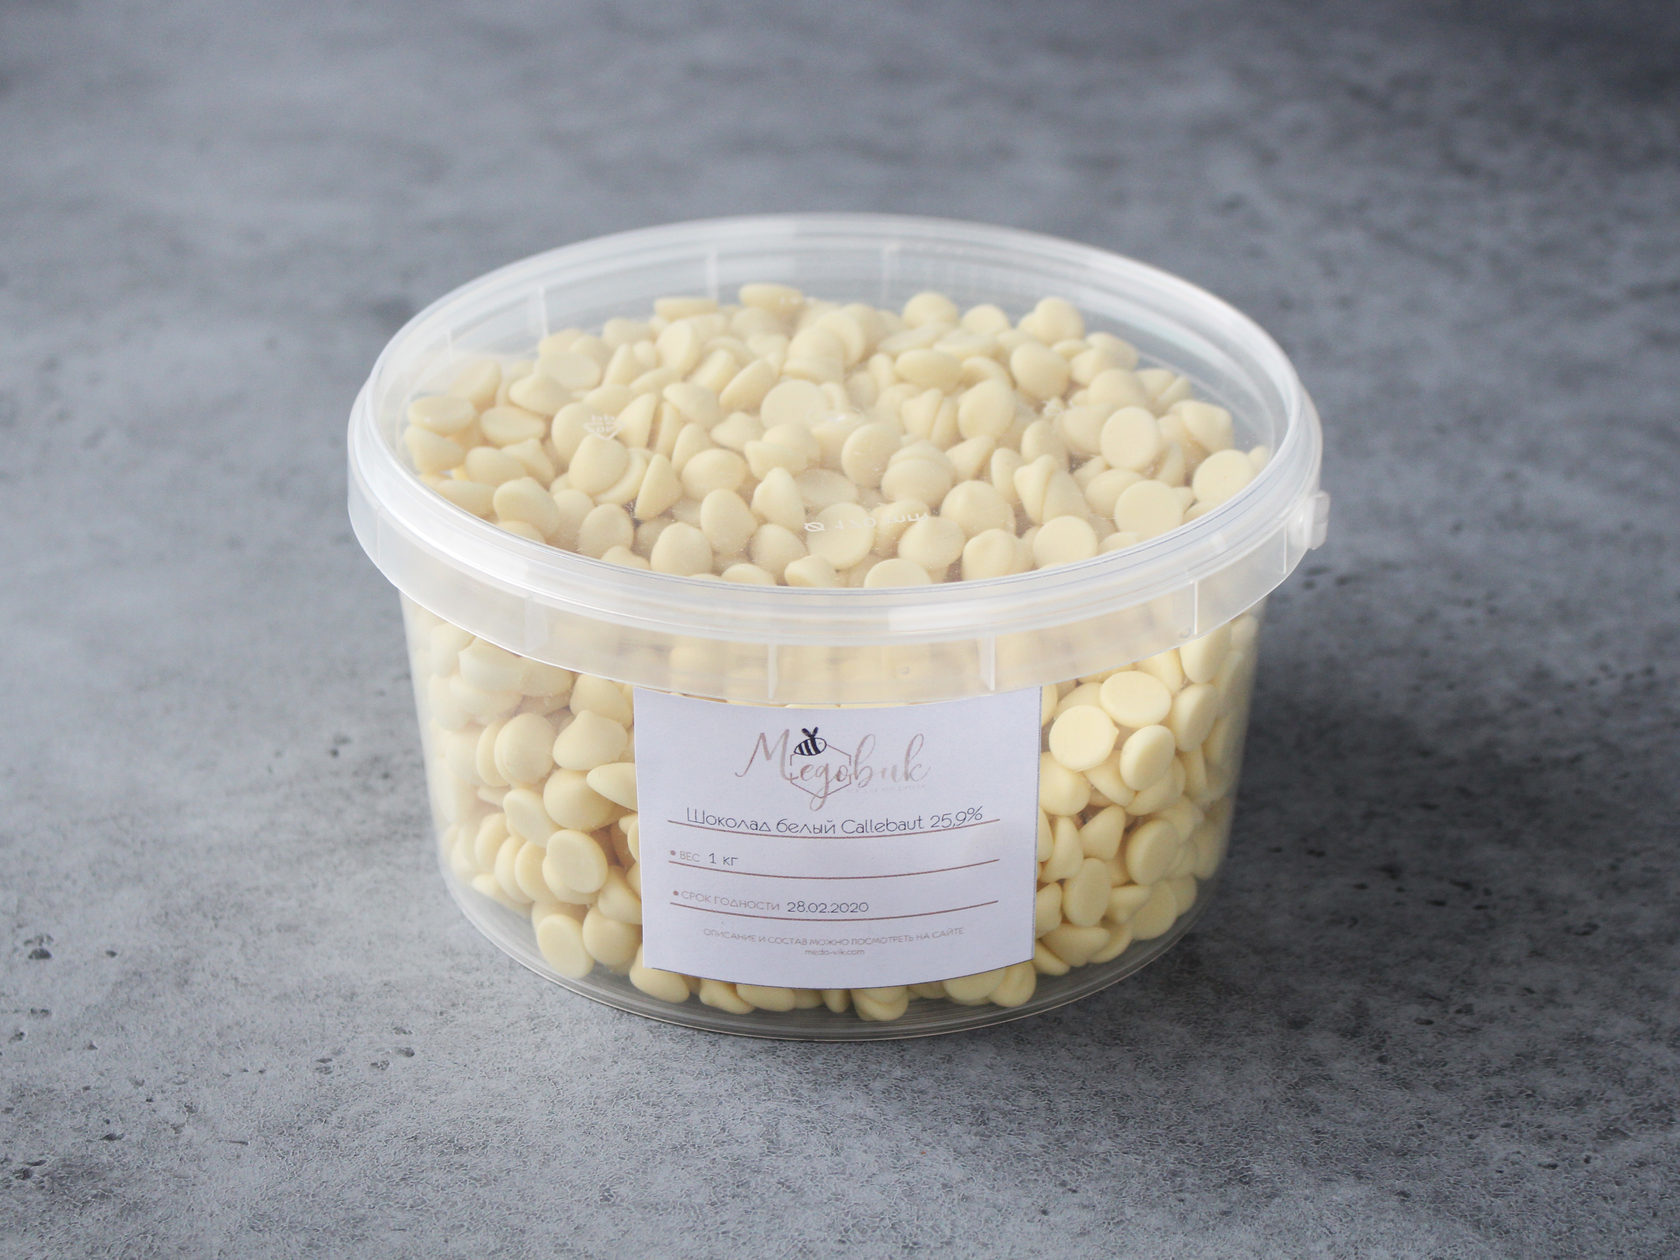 Шоколад белый Barry Callebaut 25,9%, 1 кг